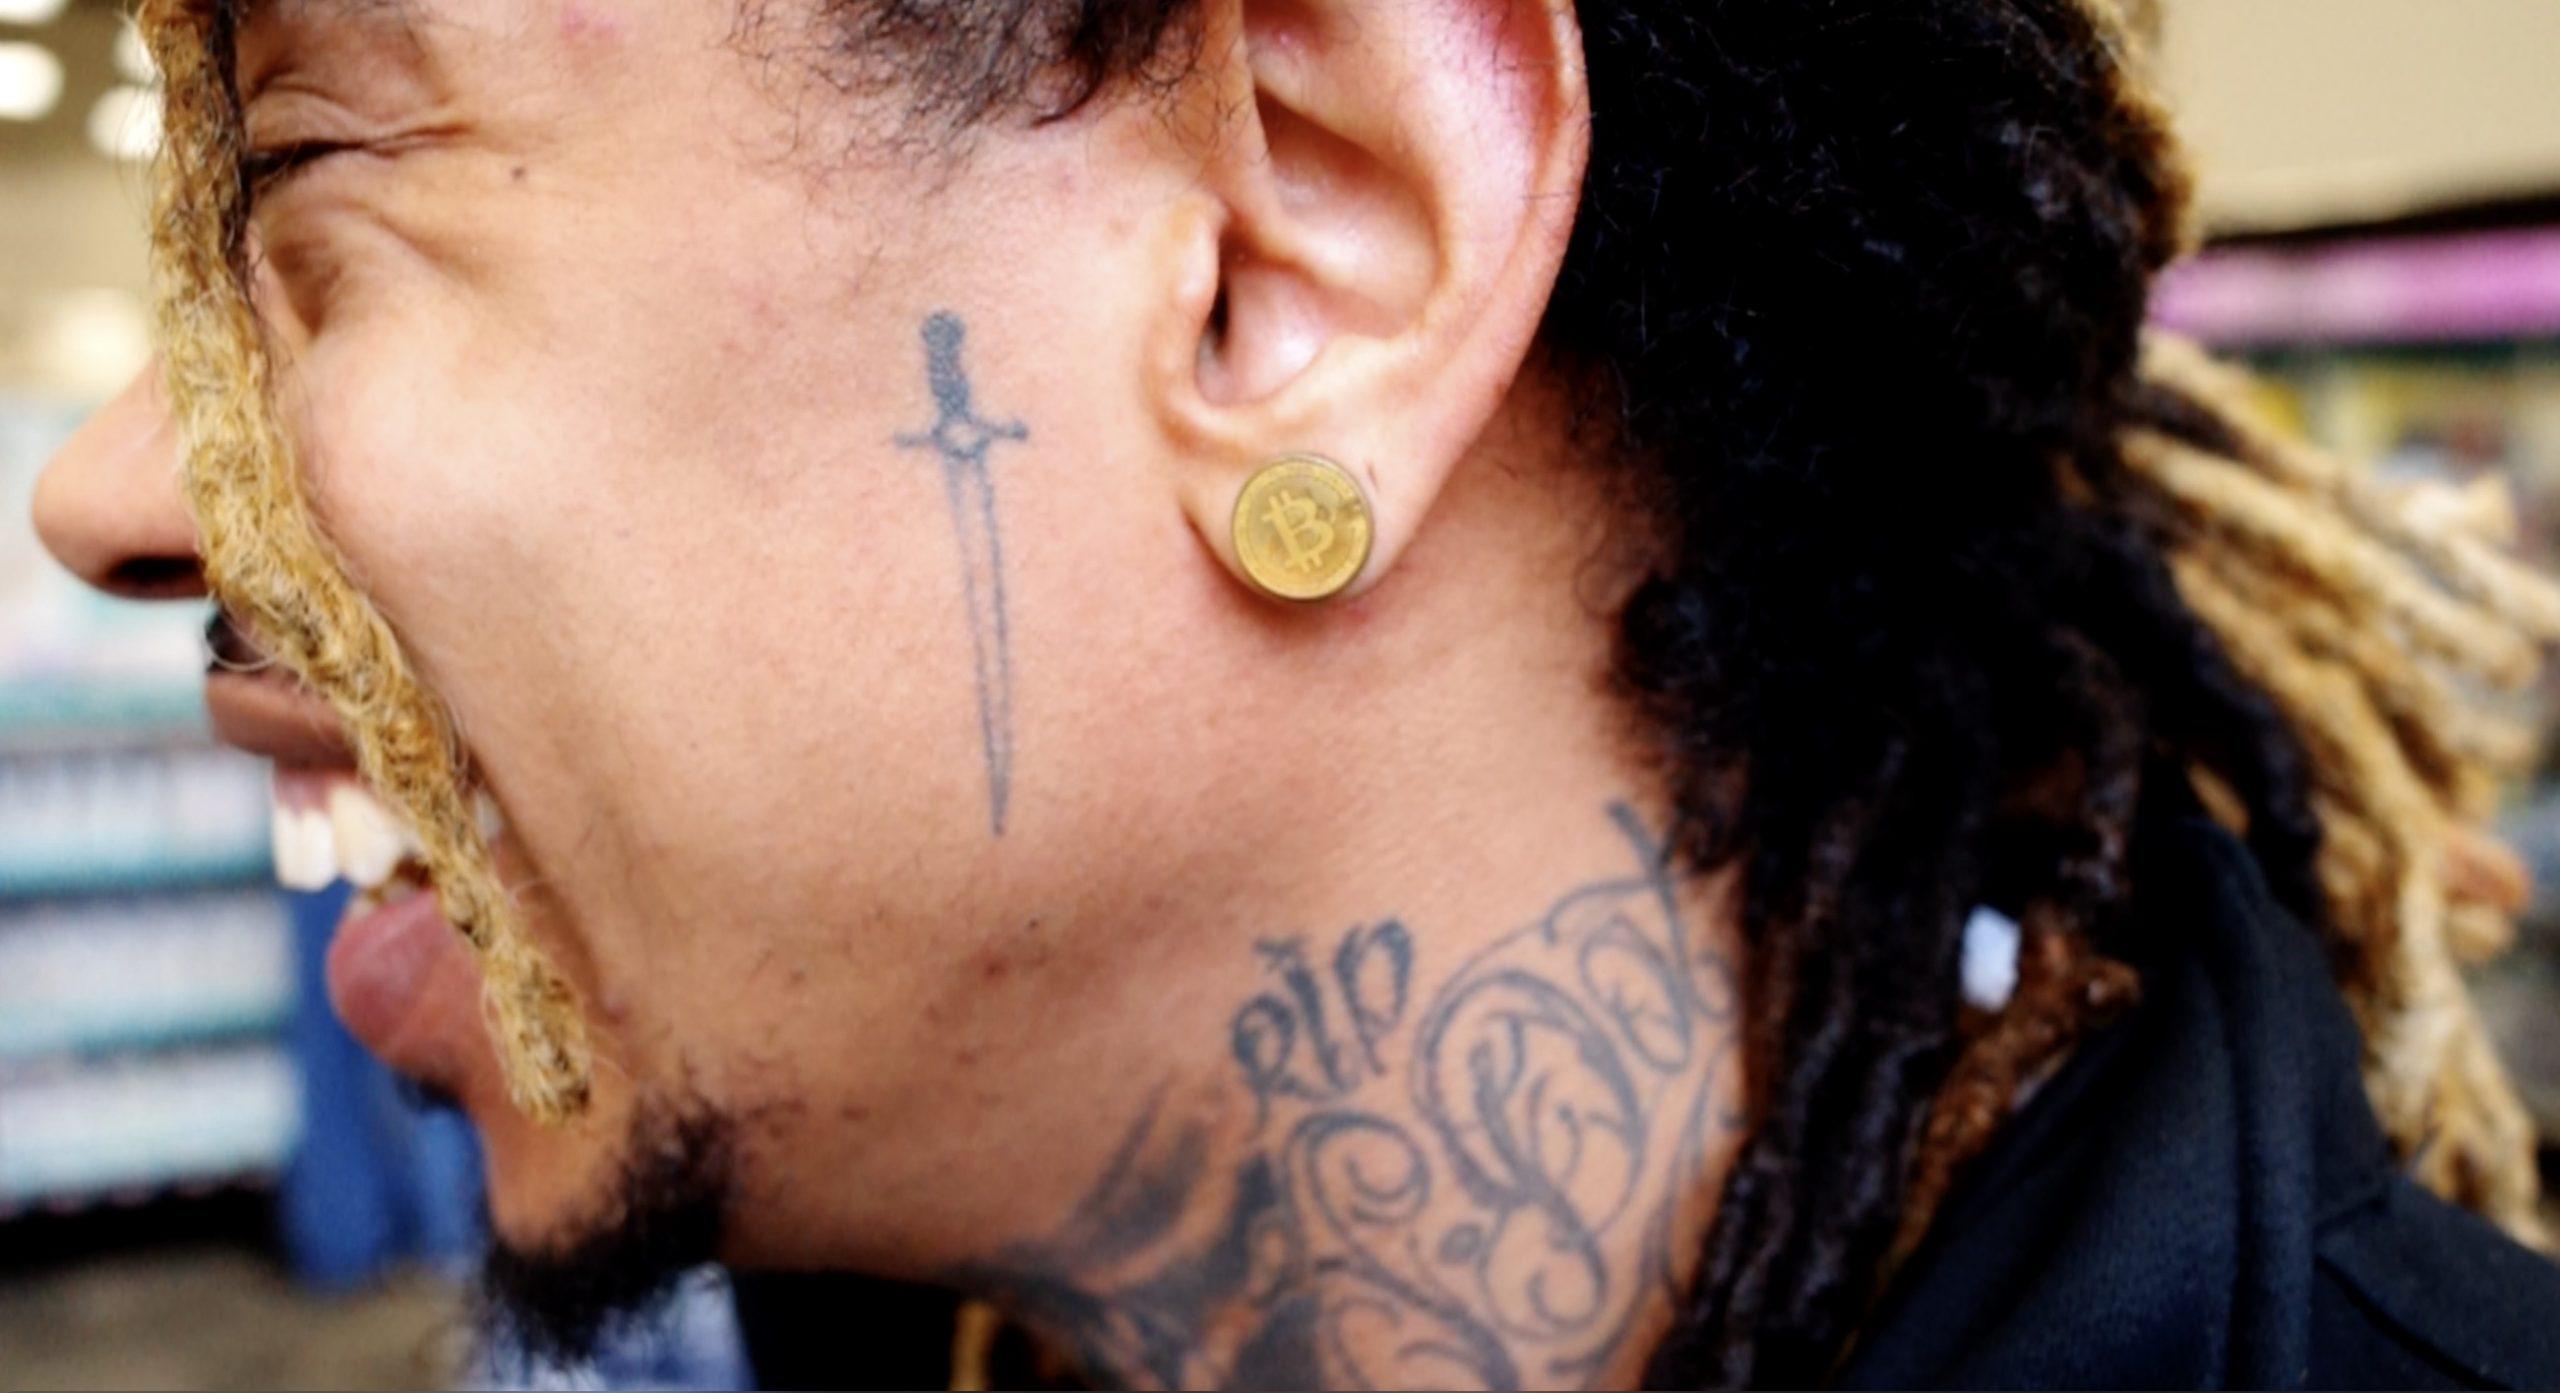 Bitcoin earring